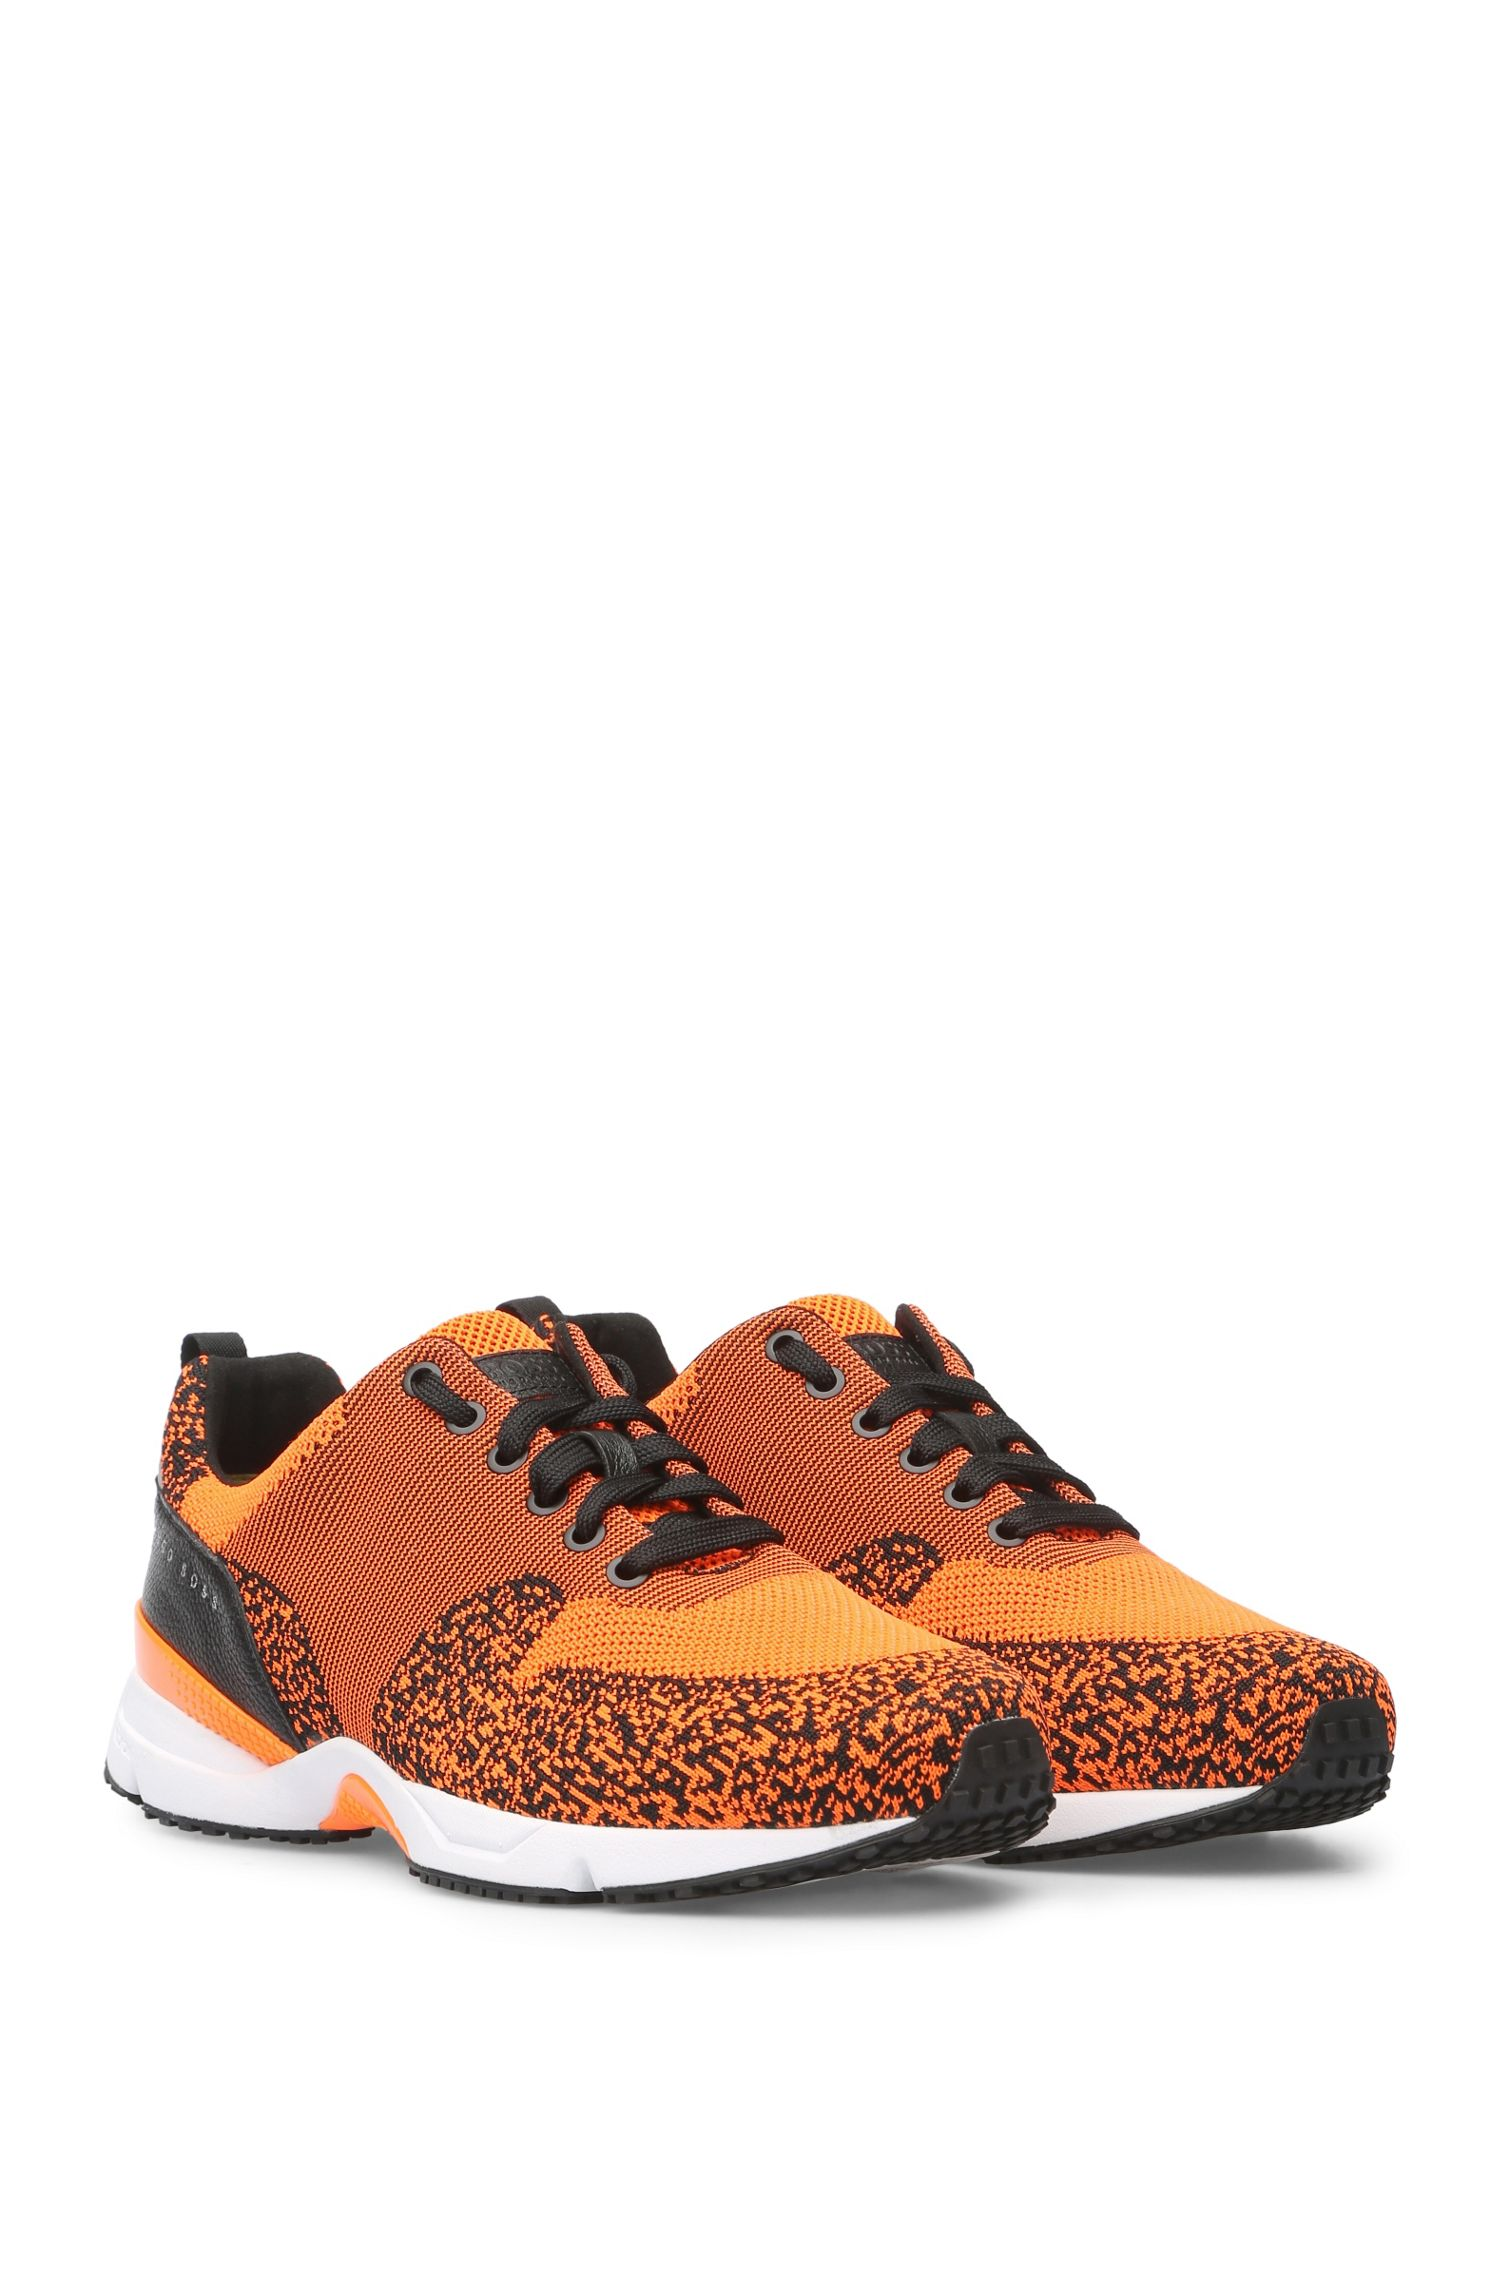 'Velocity Runn Sykn' | Knit Upper Sneakers